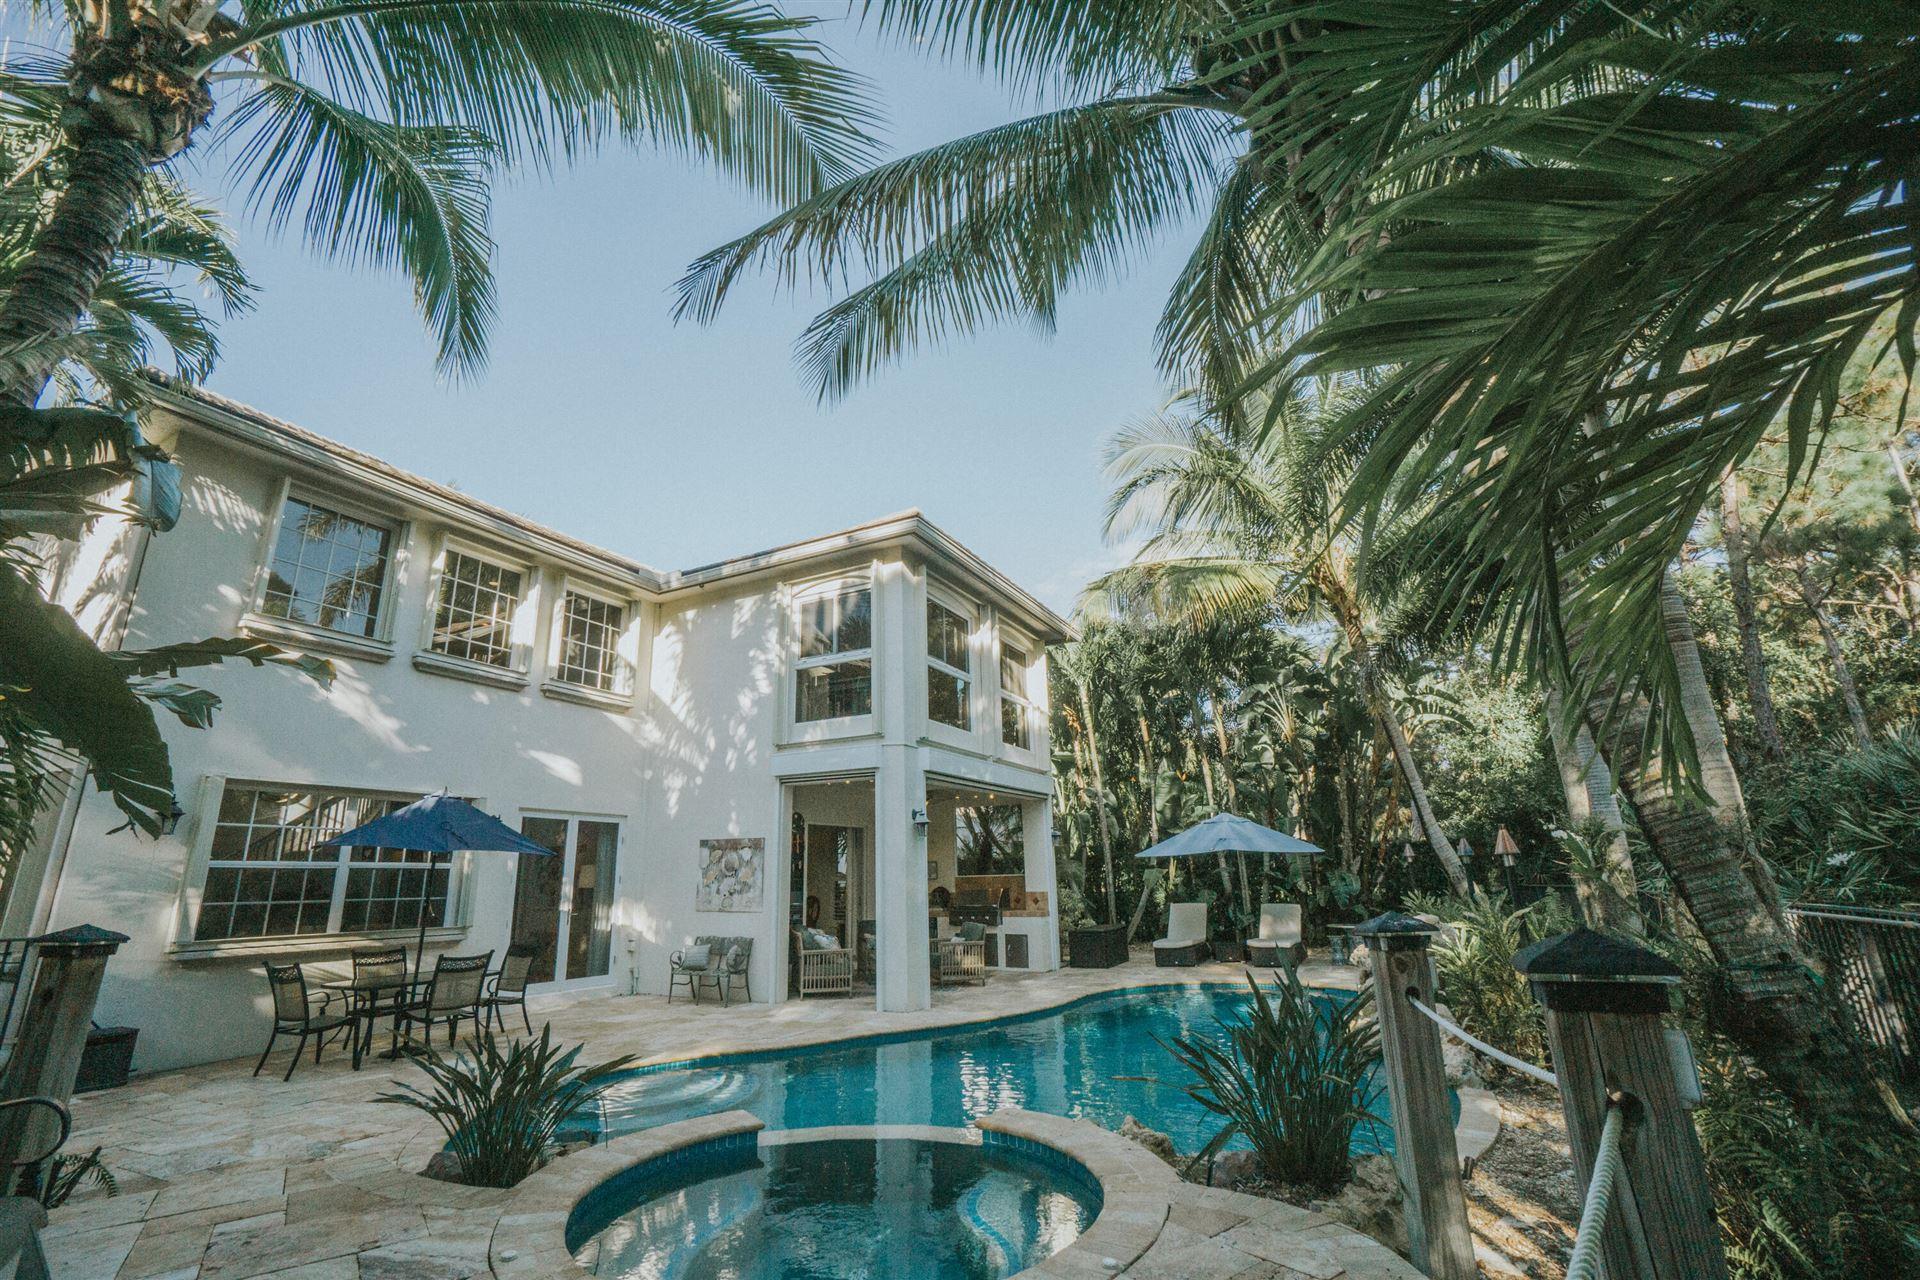 Photo of 746 Bocce Court, Palm Beach Gardens, FL 33410 (MLS # RX-10747933)